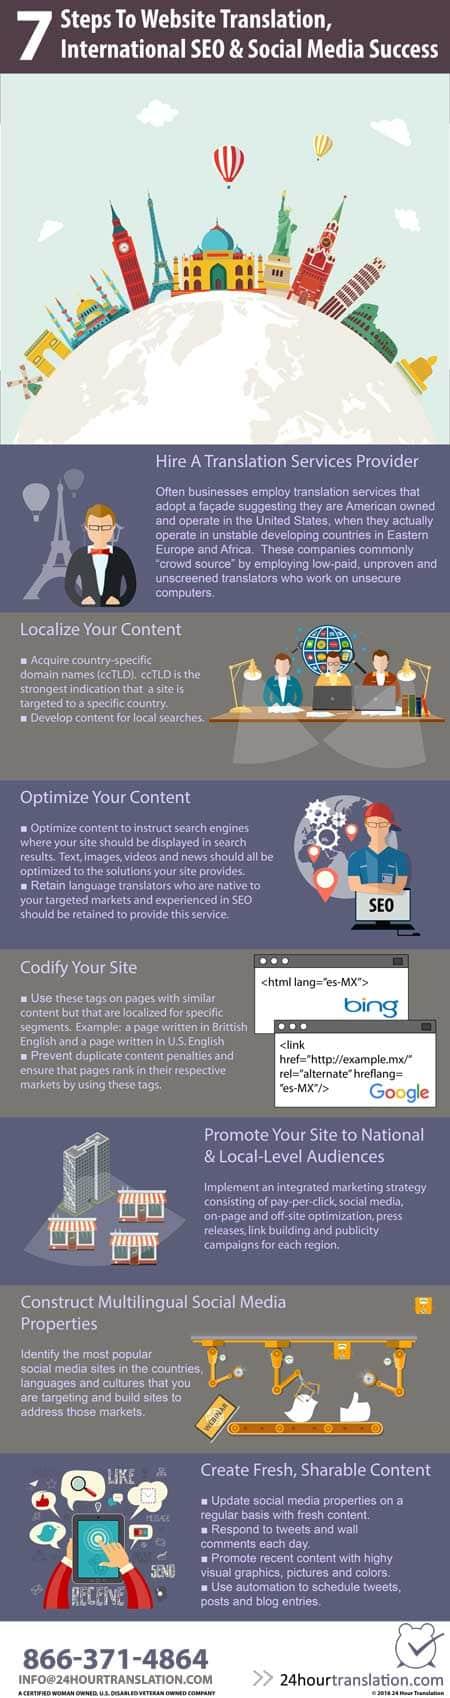 Simple steps to website translation, international SEO, multilingual website, and socila media success.